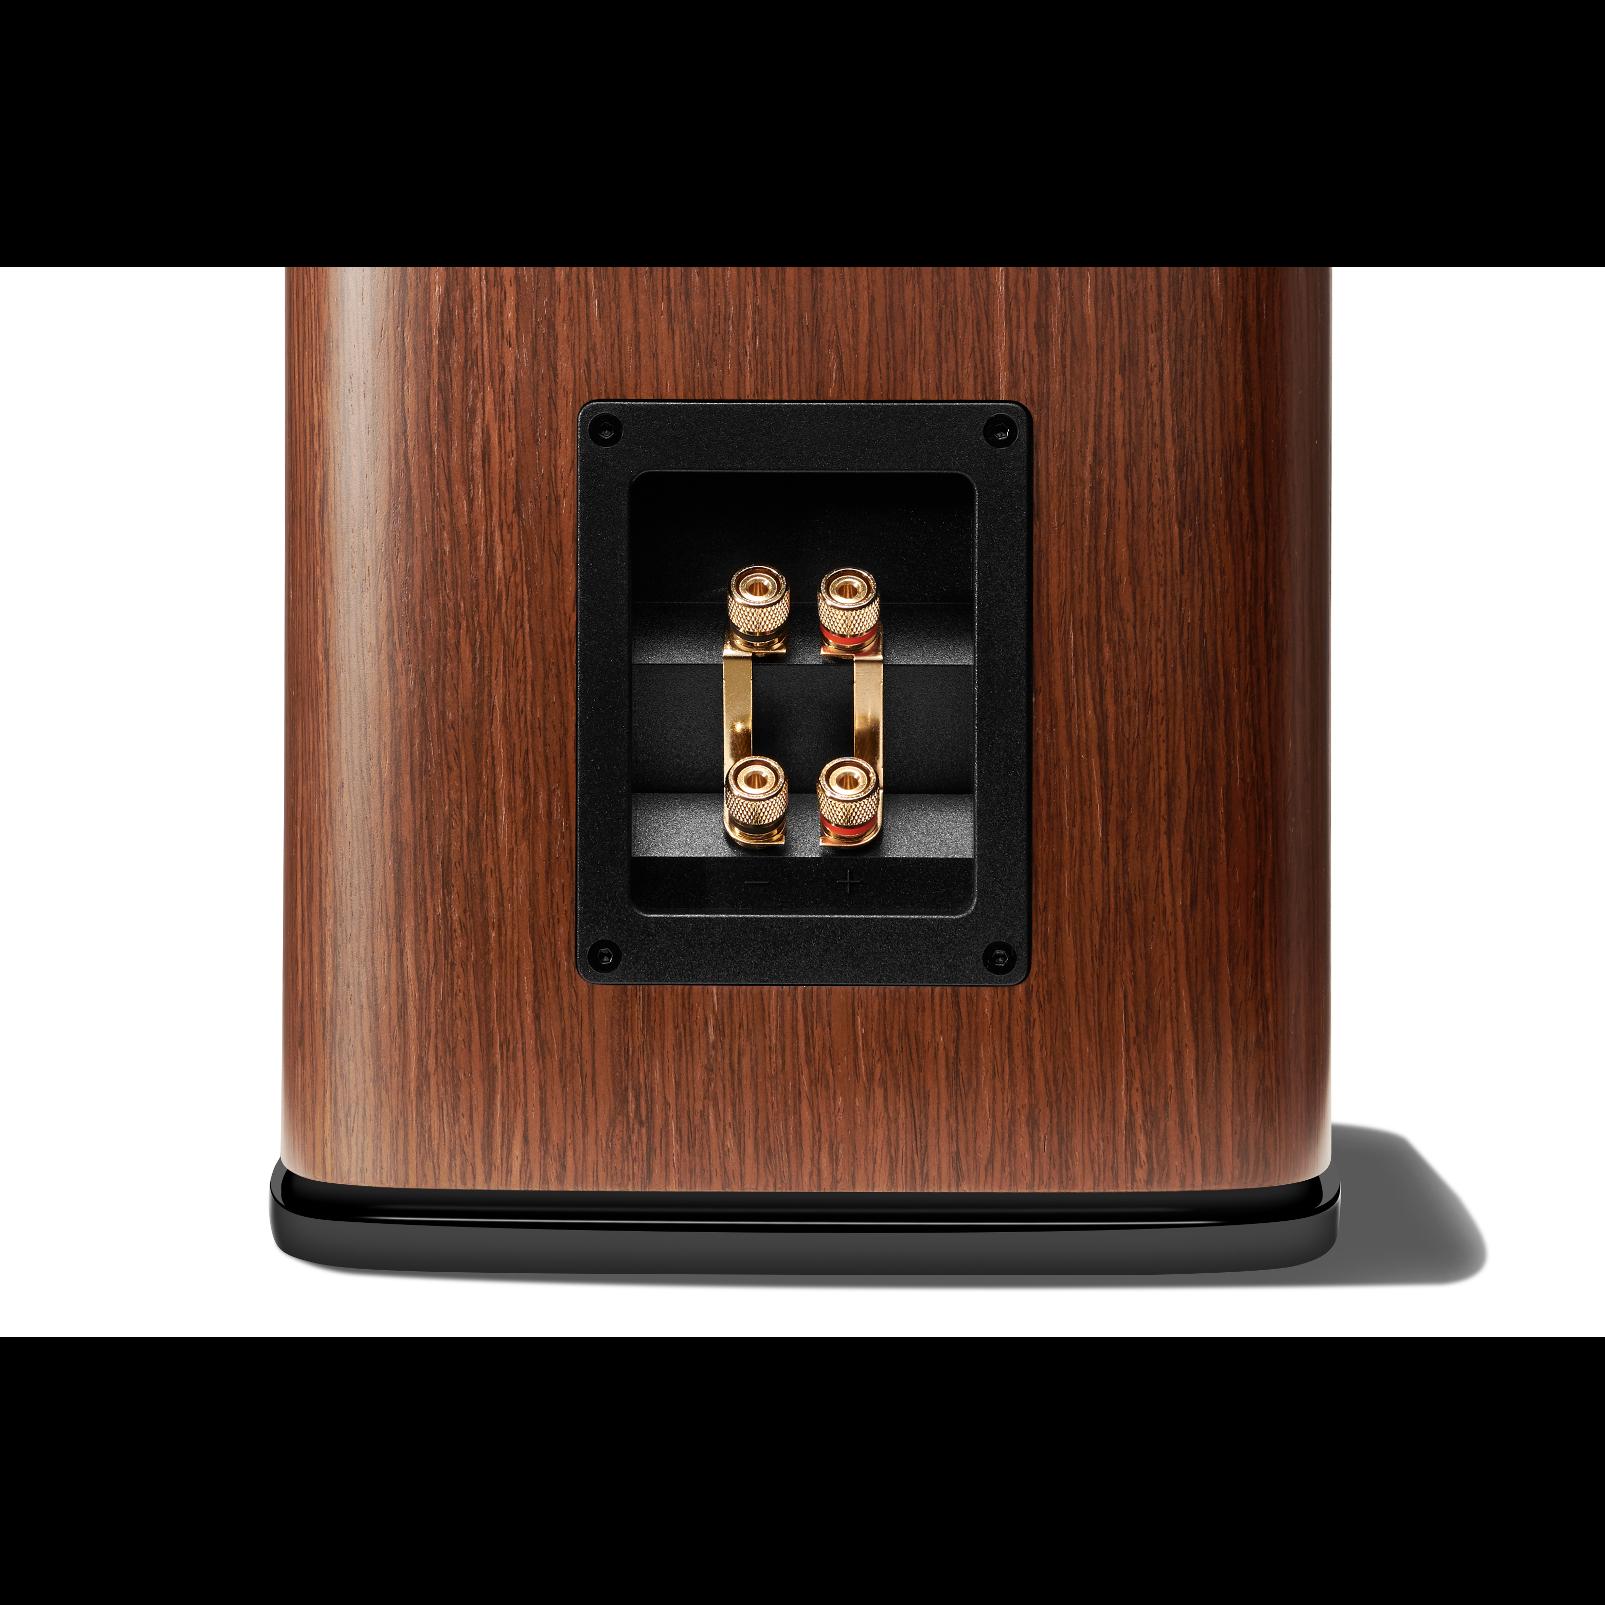 HDI-1600 - Walnut - 2-way 6.5-inch (165mm) Bookshelf Loudspeaker - Detailshot 3